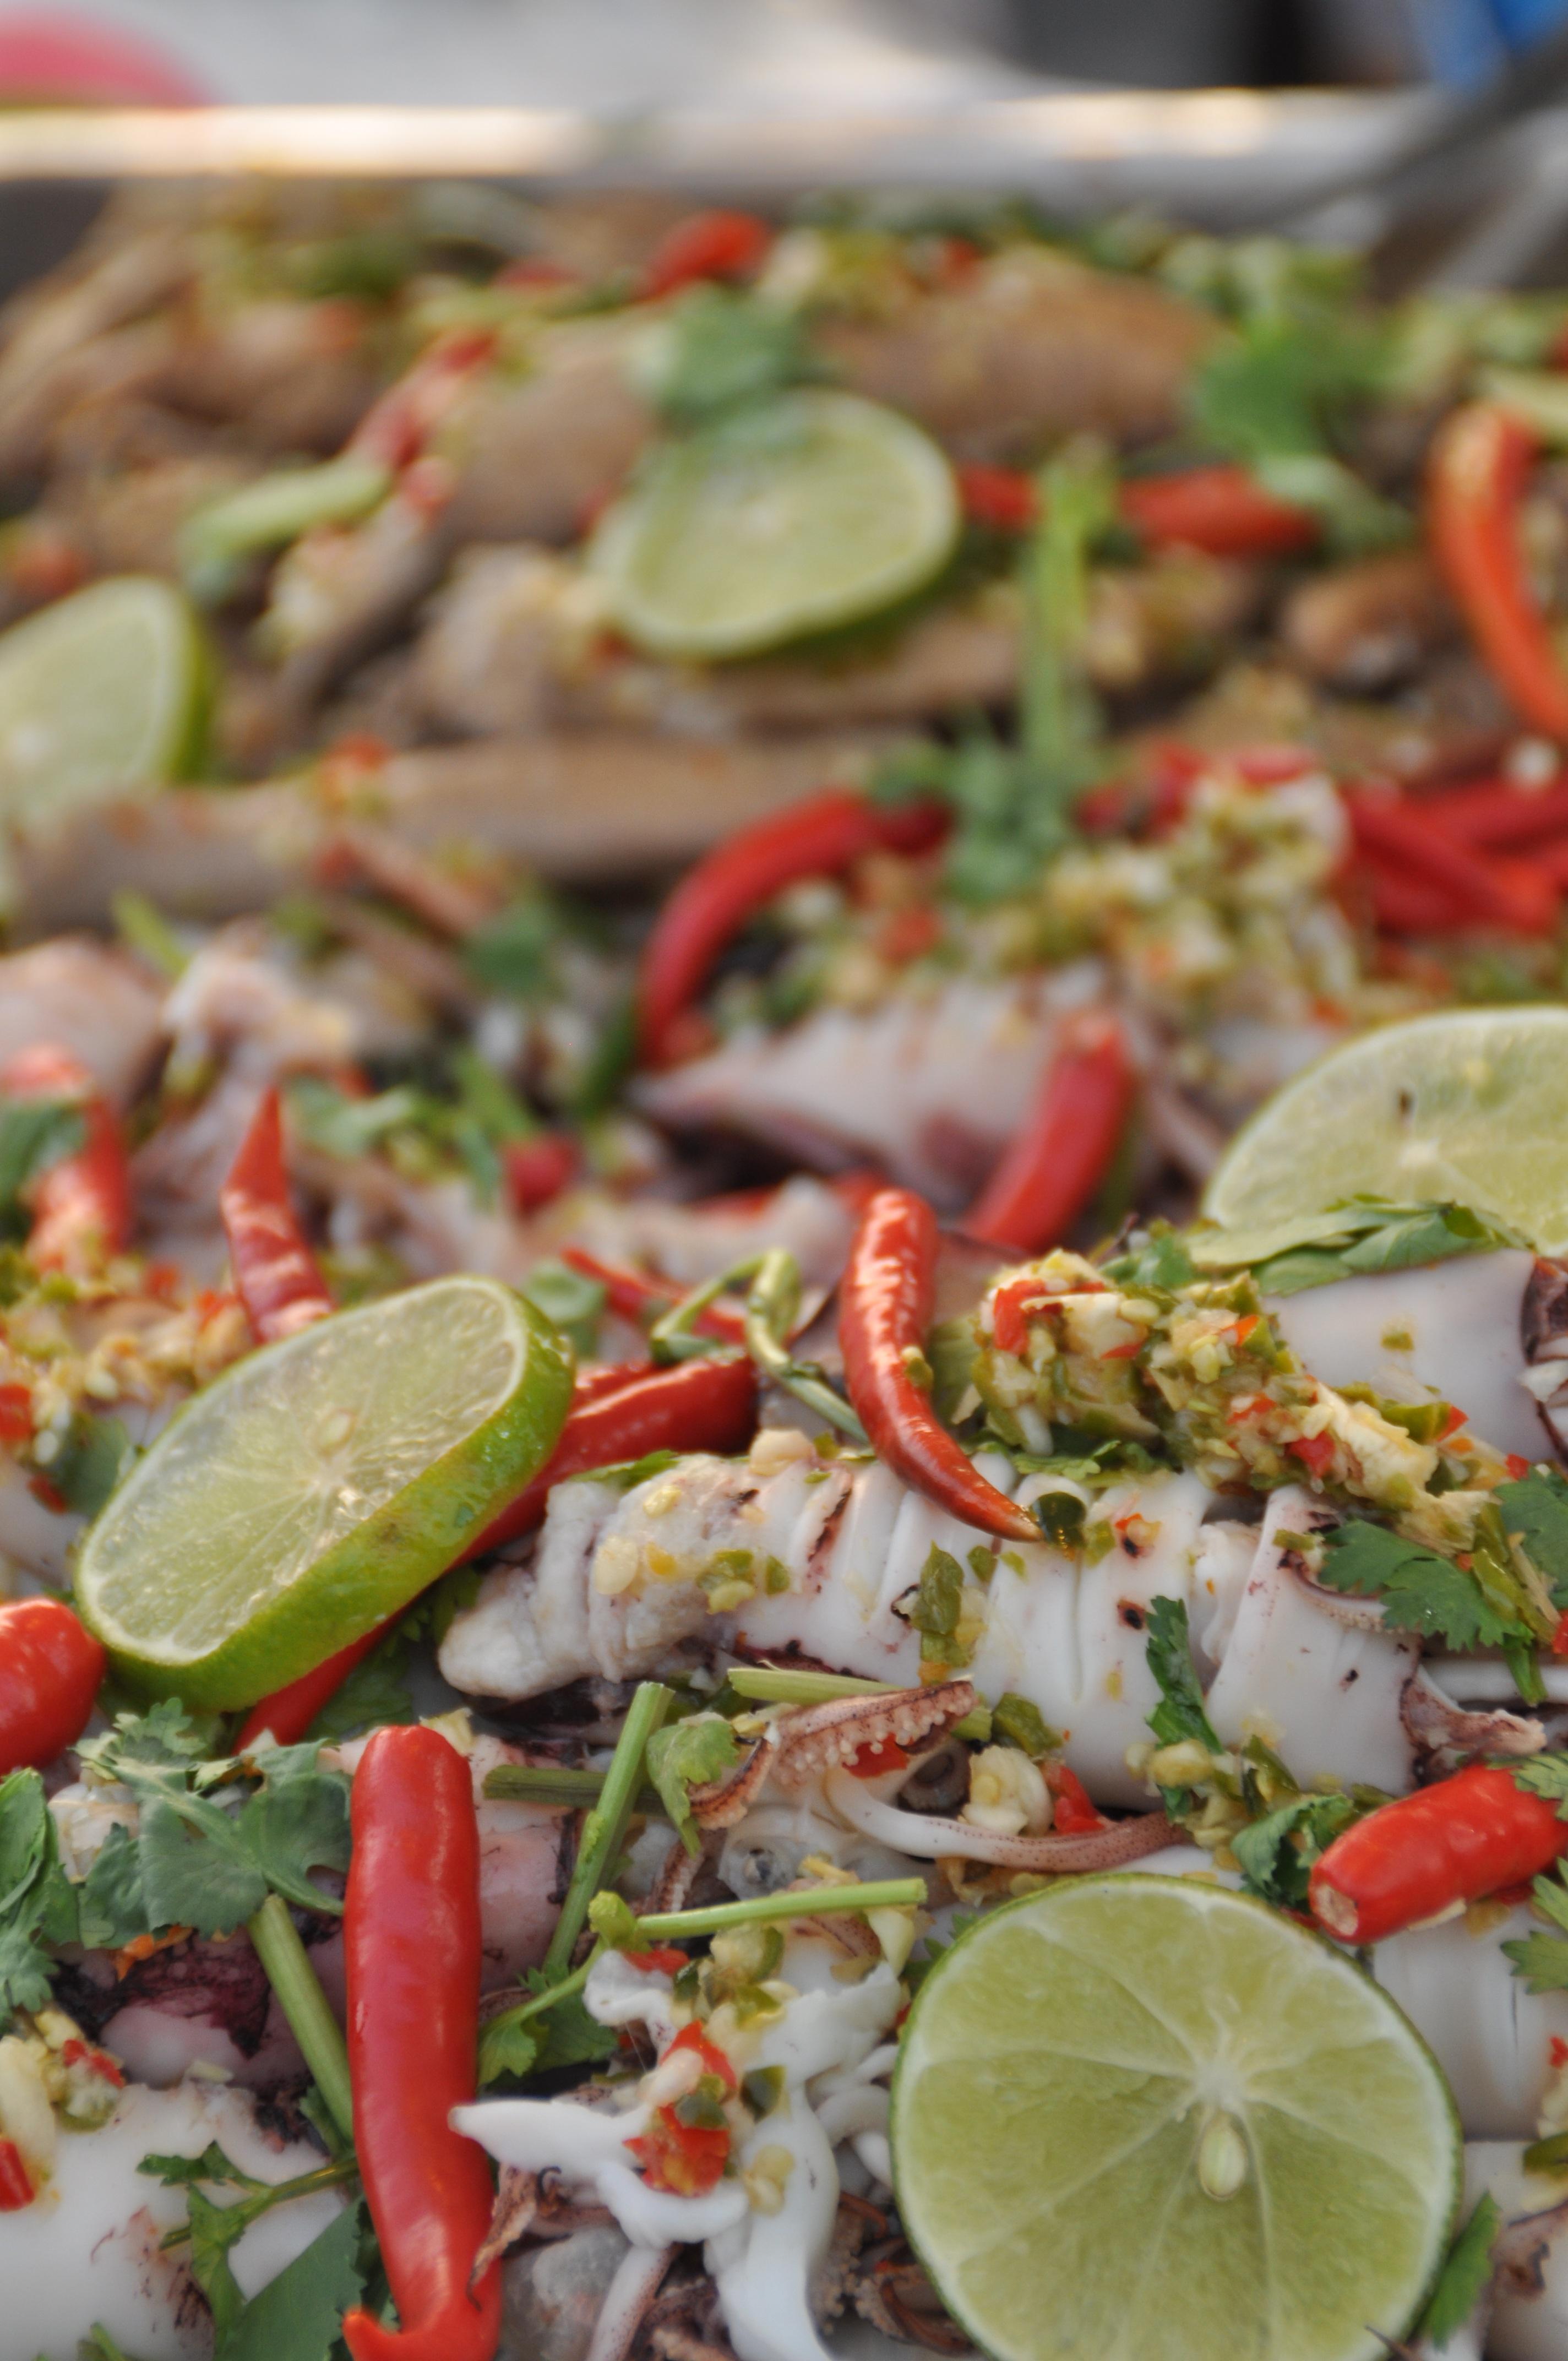 Free Images Dish Salad Produce Vegetable Fish Cuisine Delicious Thailand Street Food Eat Thai Thai Kitchen 2848x4288 566672 Free Stock Photos Pxhere